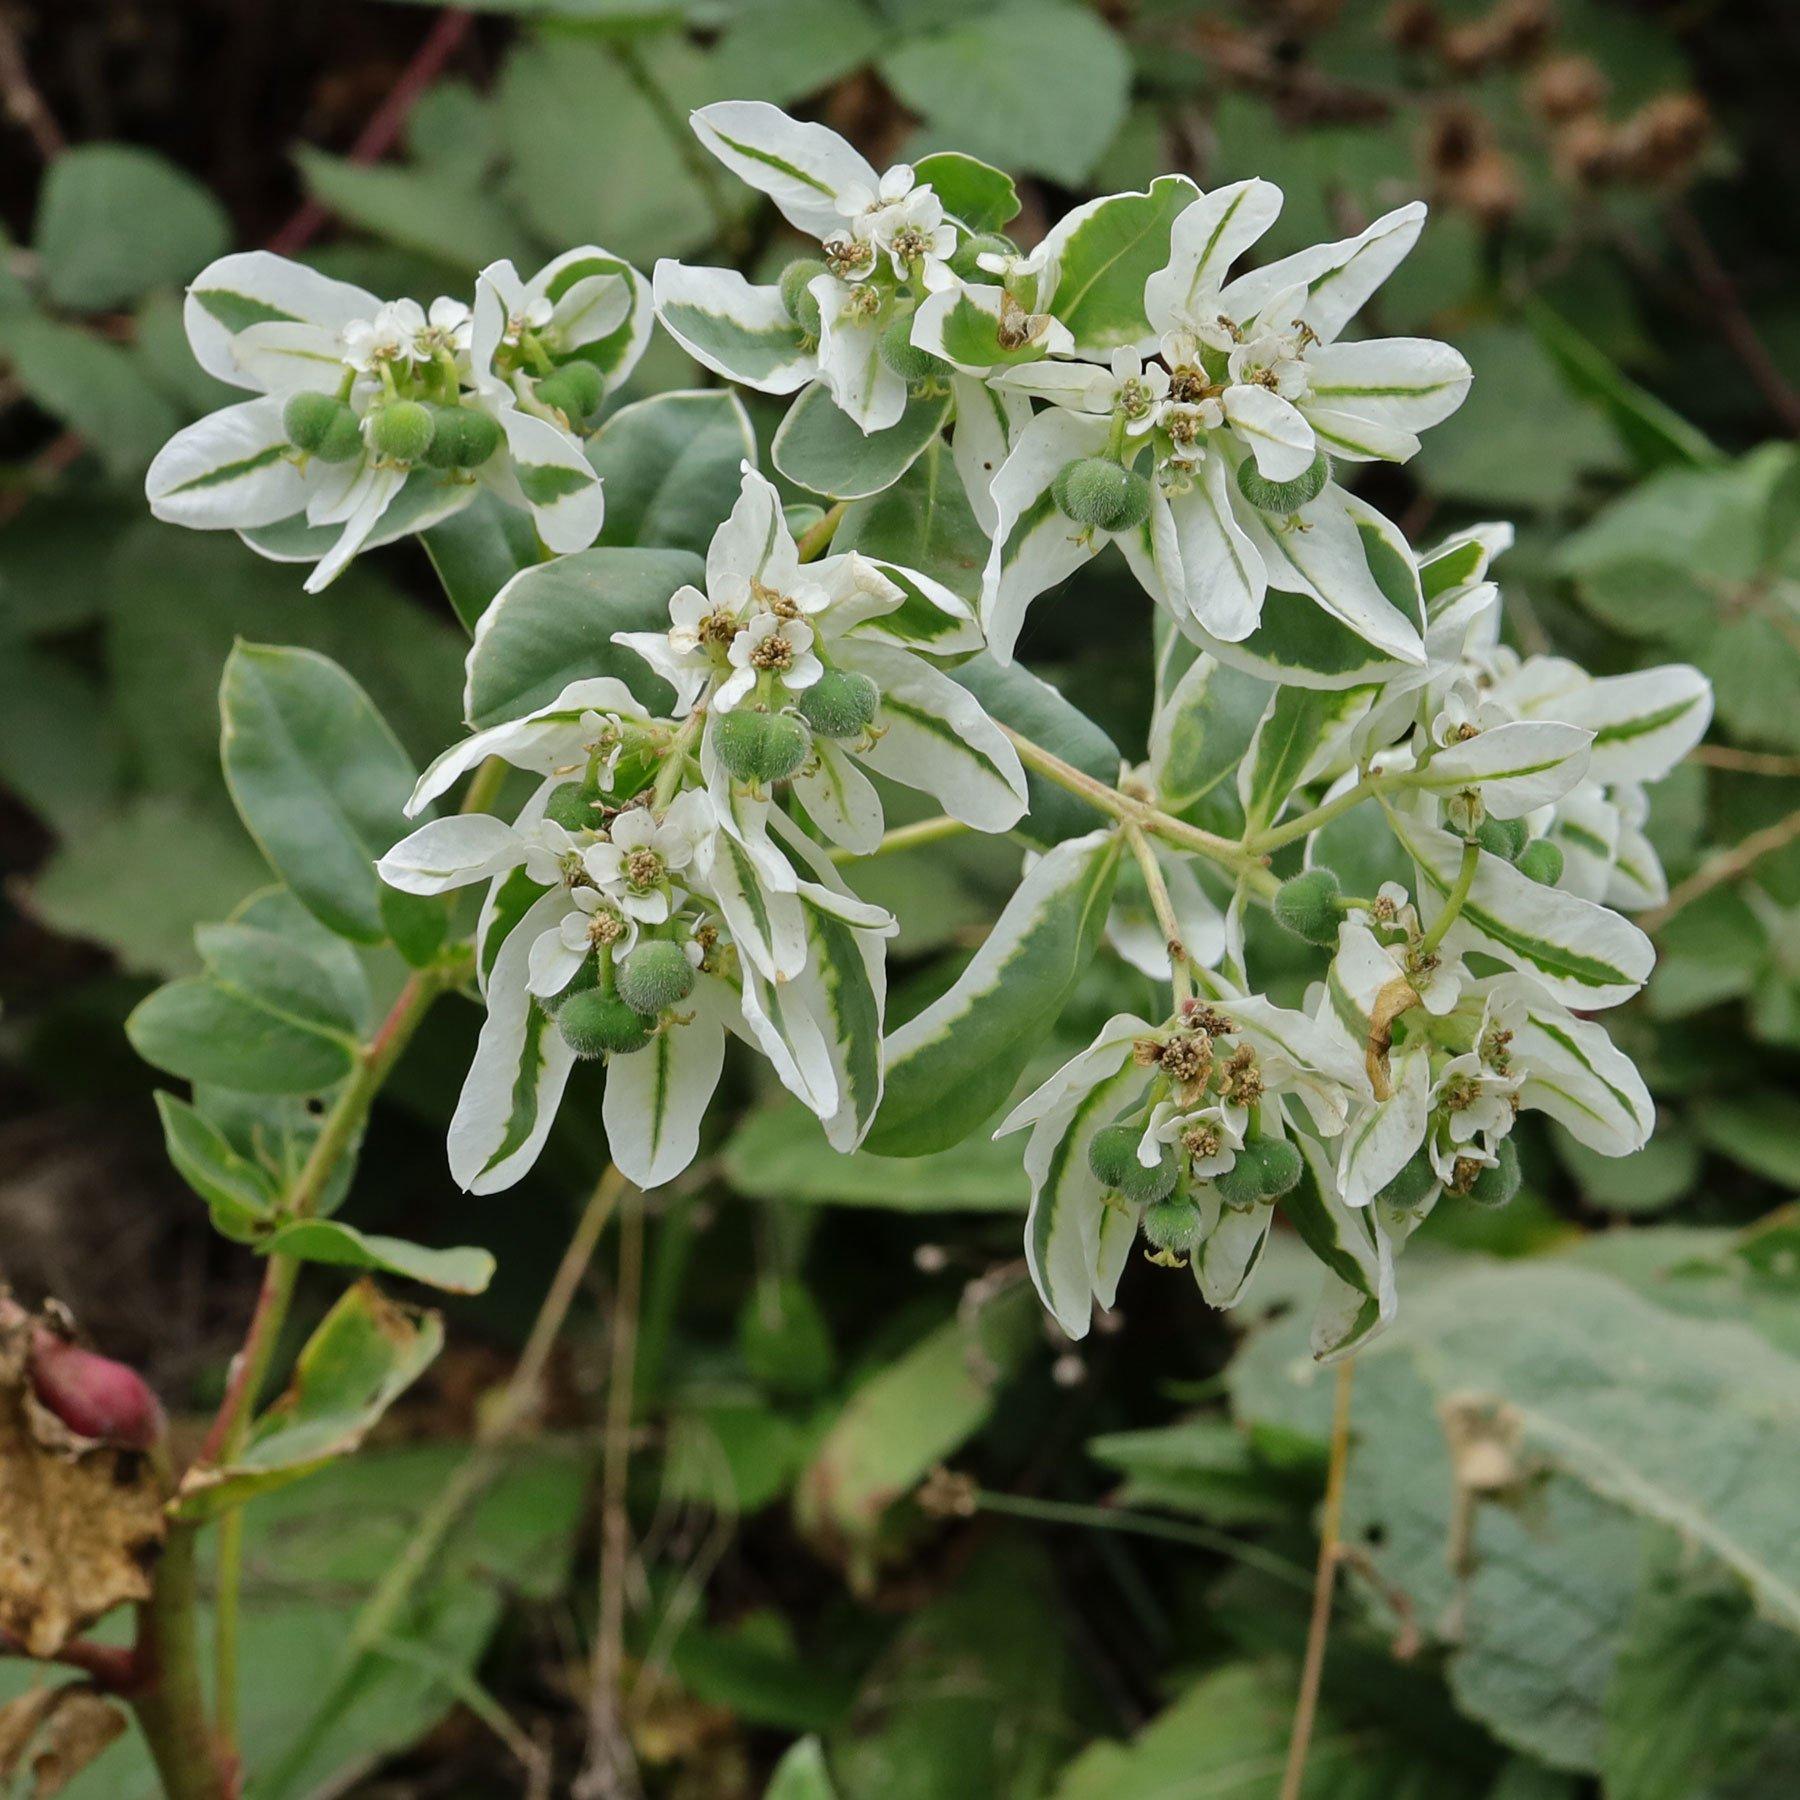 Euphorbia marginata